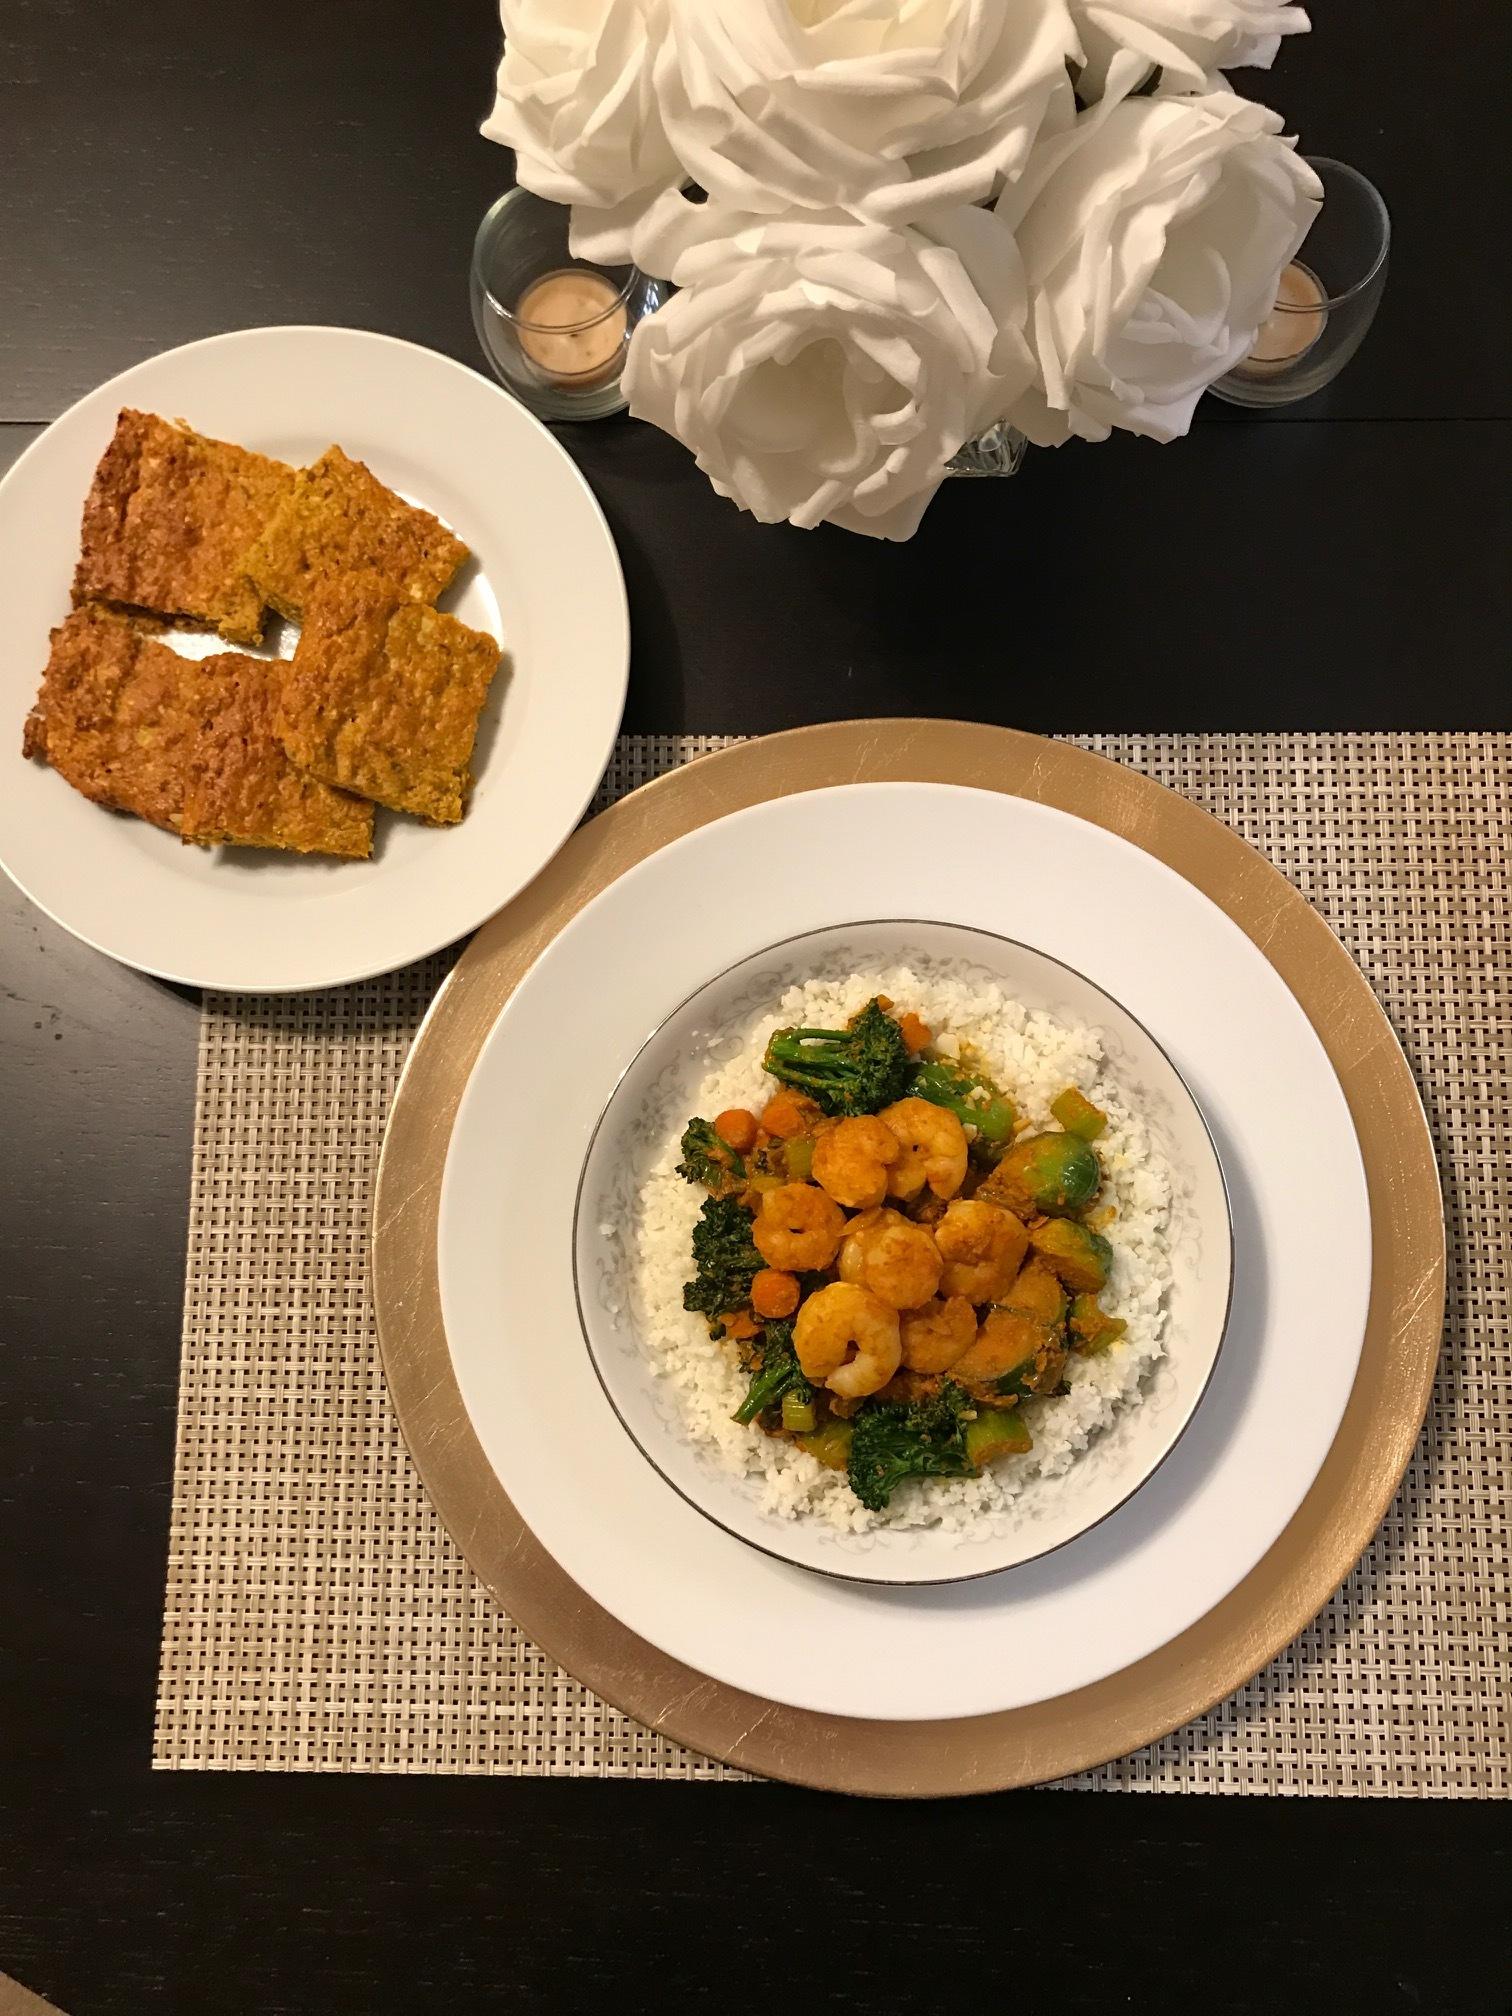 Turmeric Shrimp Stir Fry with Riced Cauliflower - Paleo & Whole 30